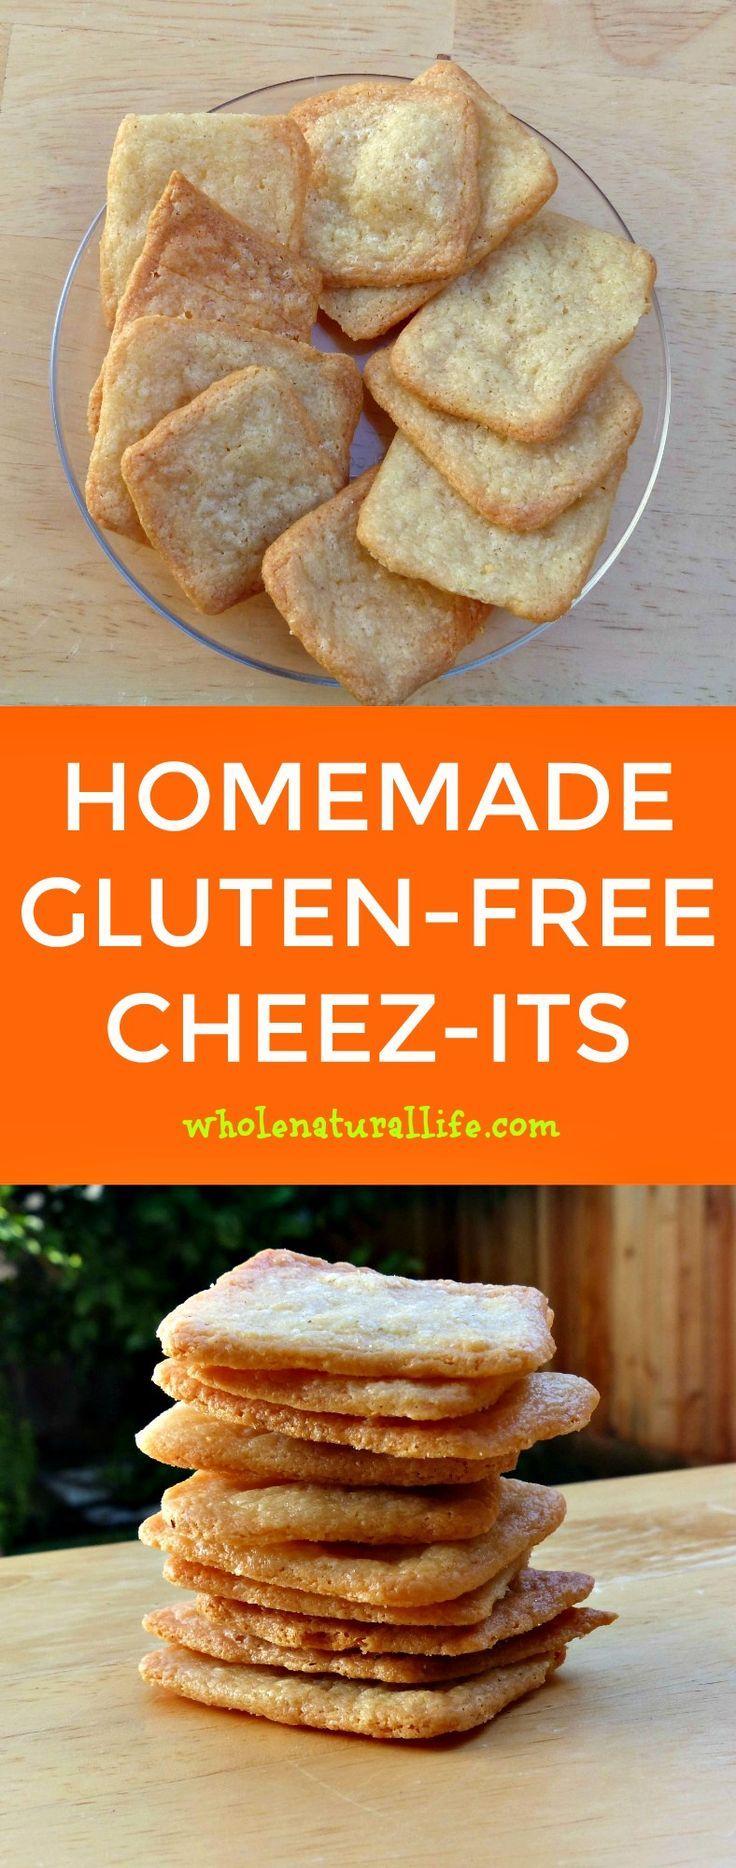 Gluten-free cheez-its | Homemade cheez-its | Gluten-free cheese crackers | Healthy cheese crackers